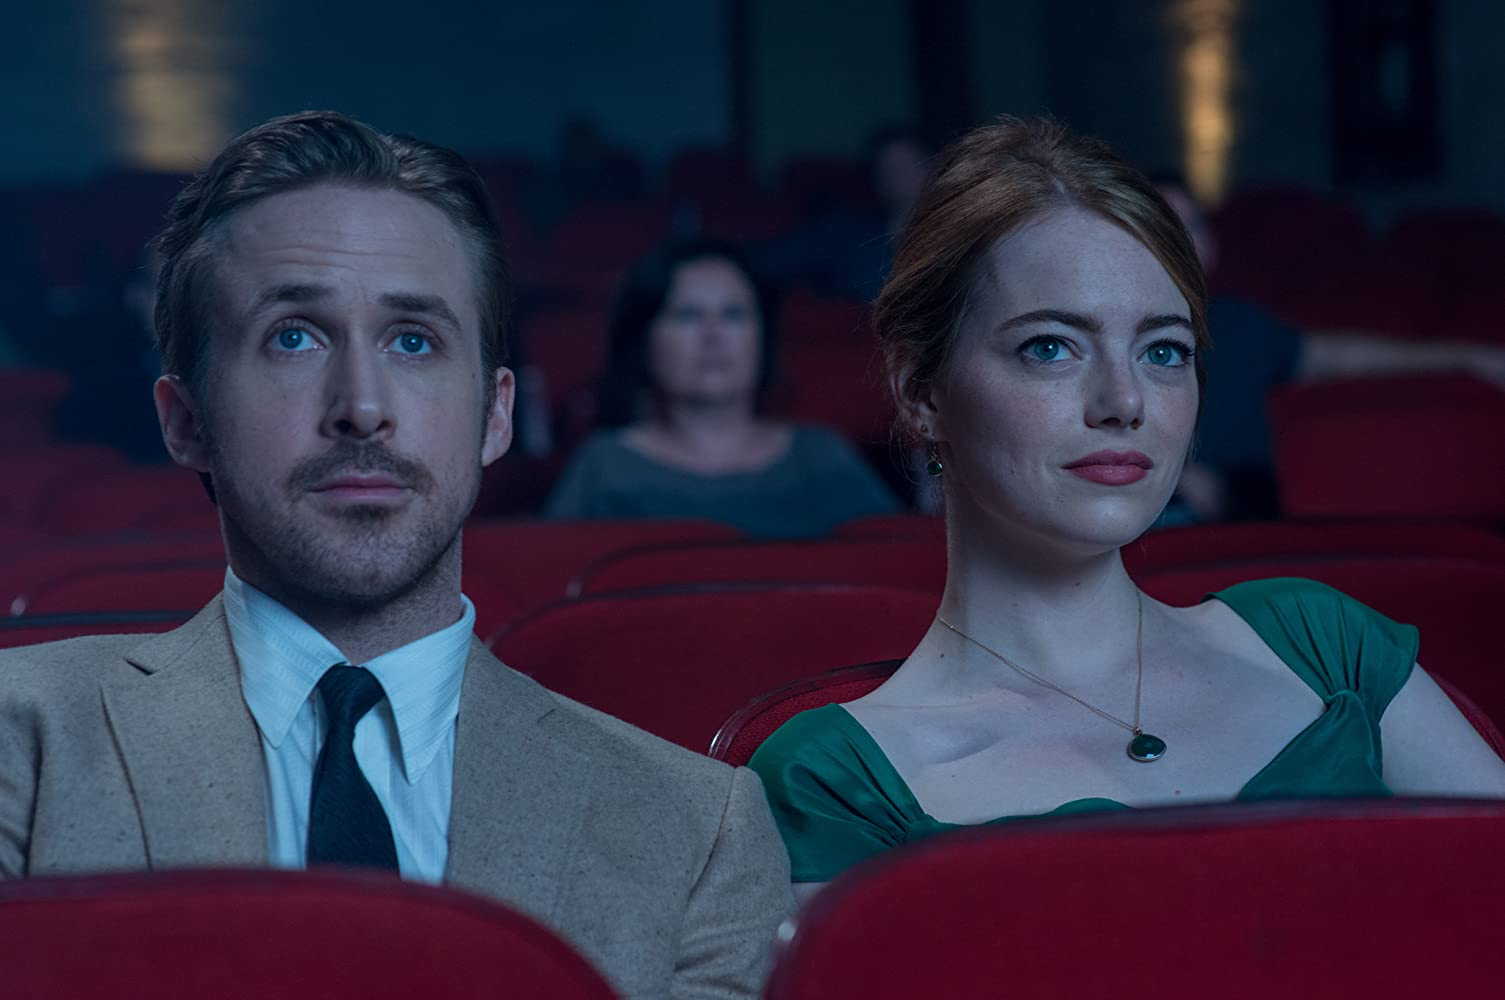 10 all-time-classic προτάσεις ταινιών